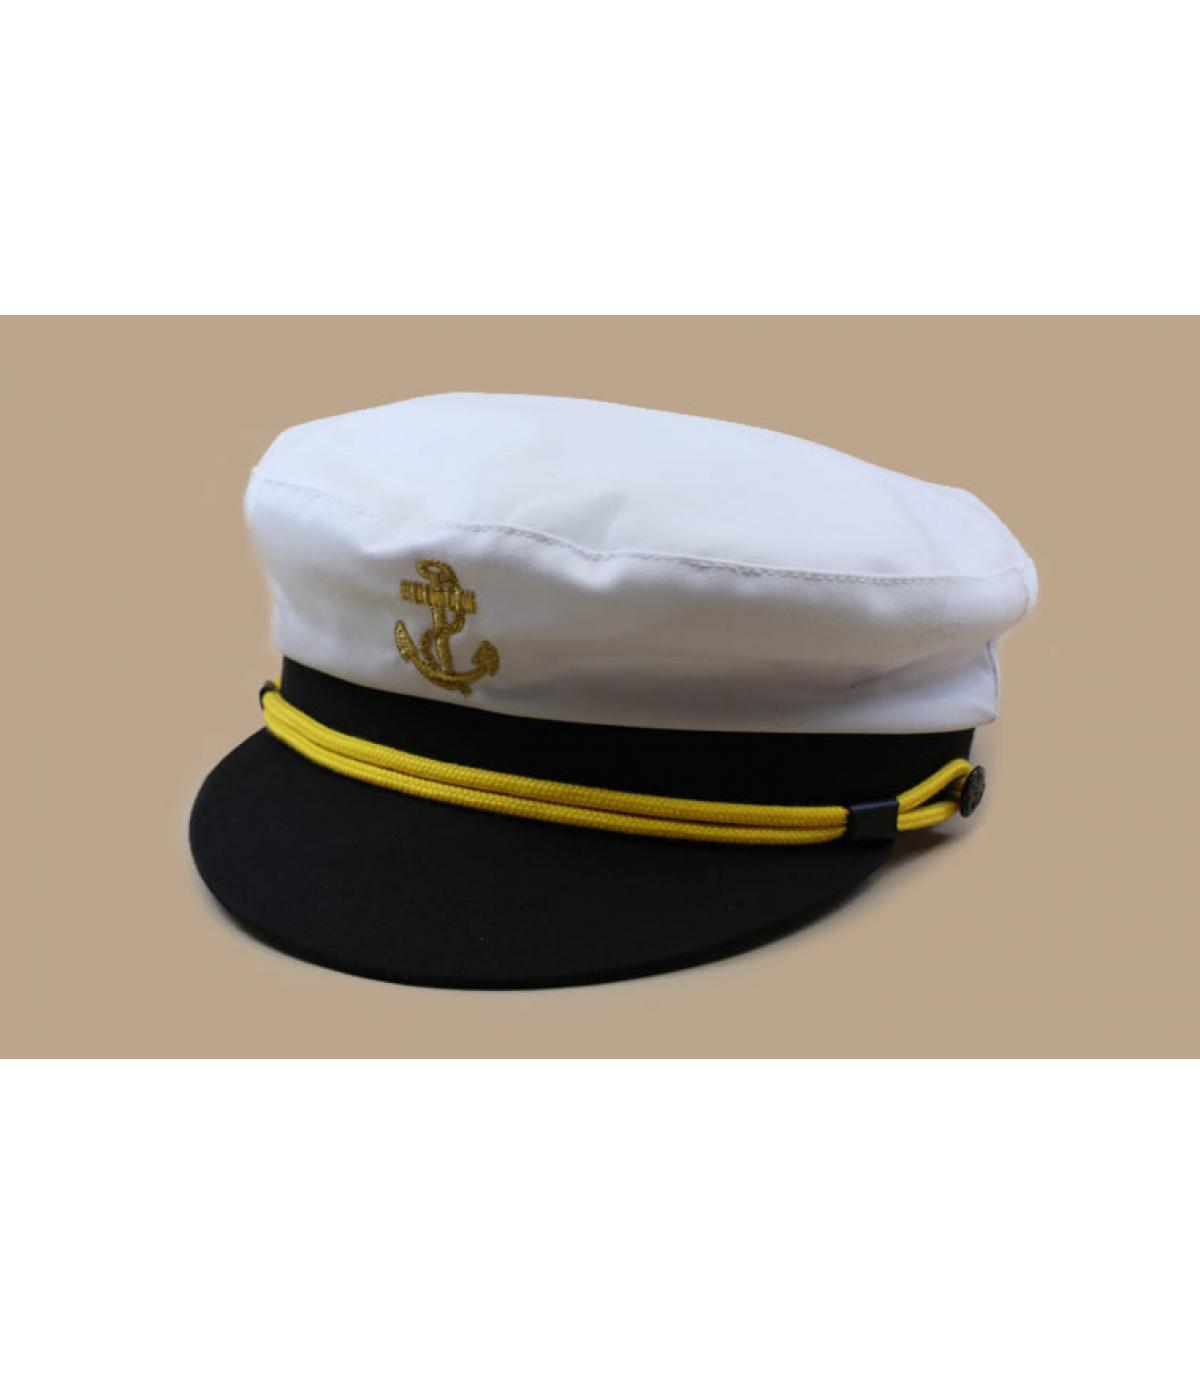 Detalles Captain cap imagen 3